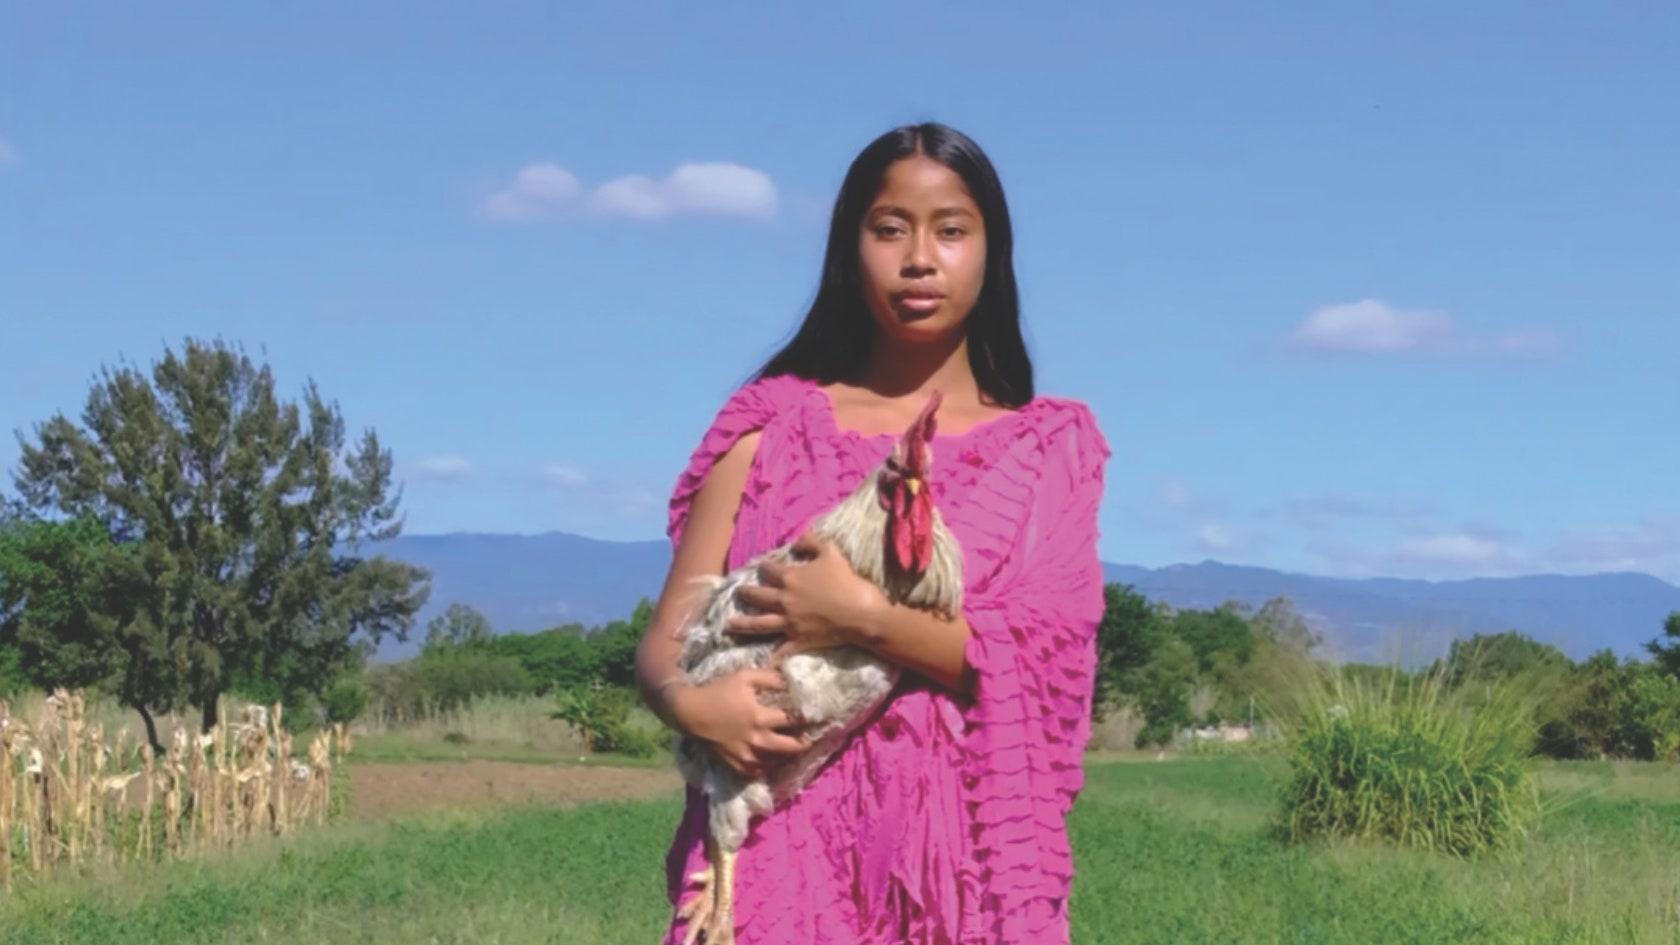 Conoce a Karen Vega: La primera modelo oaxaqueña de Vogue Mexico